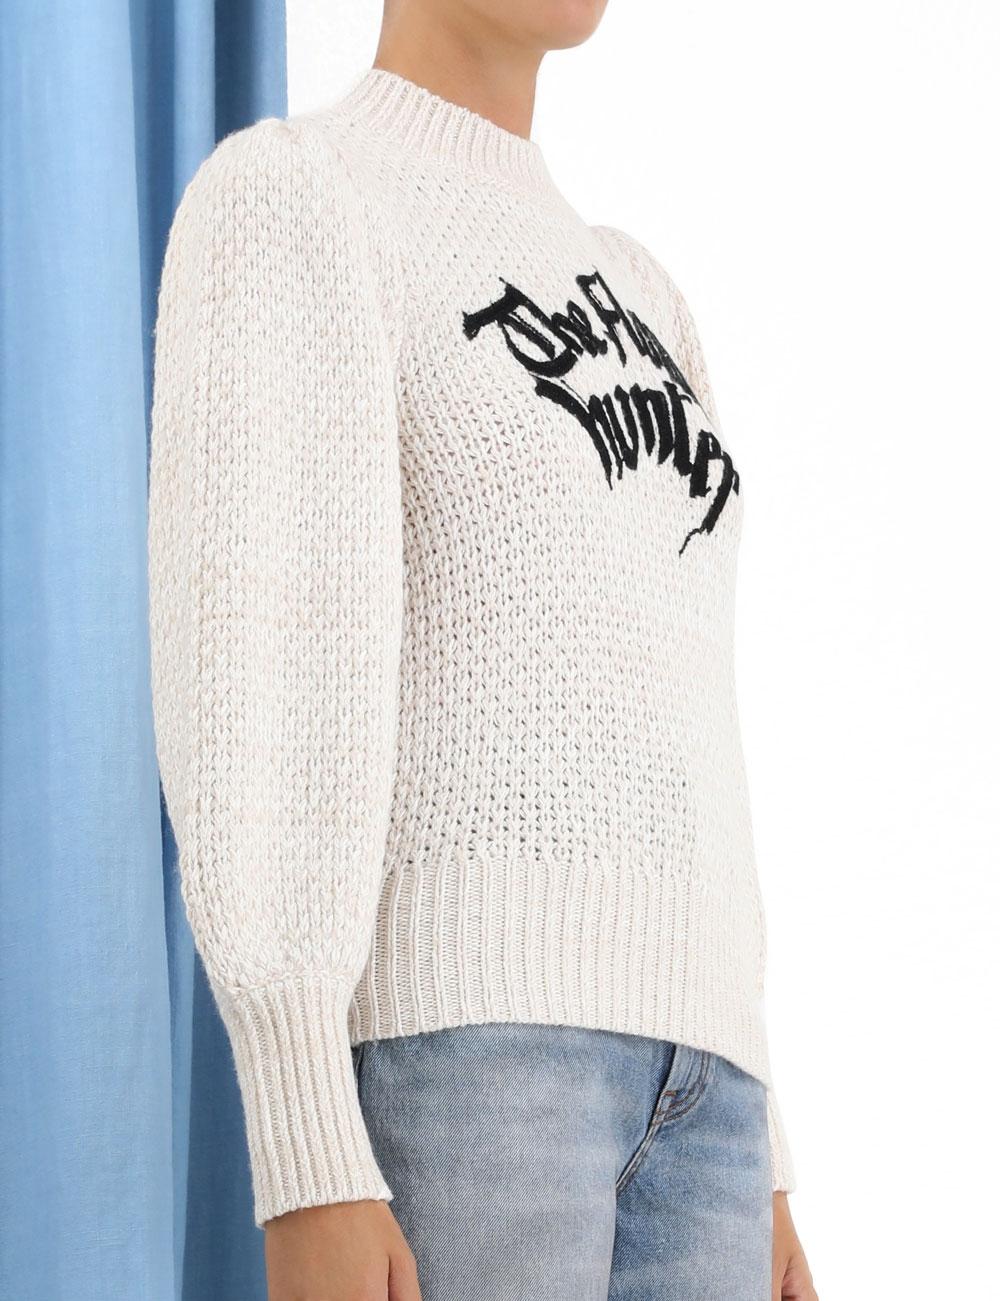 Botanica Motif Sweater